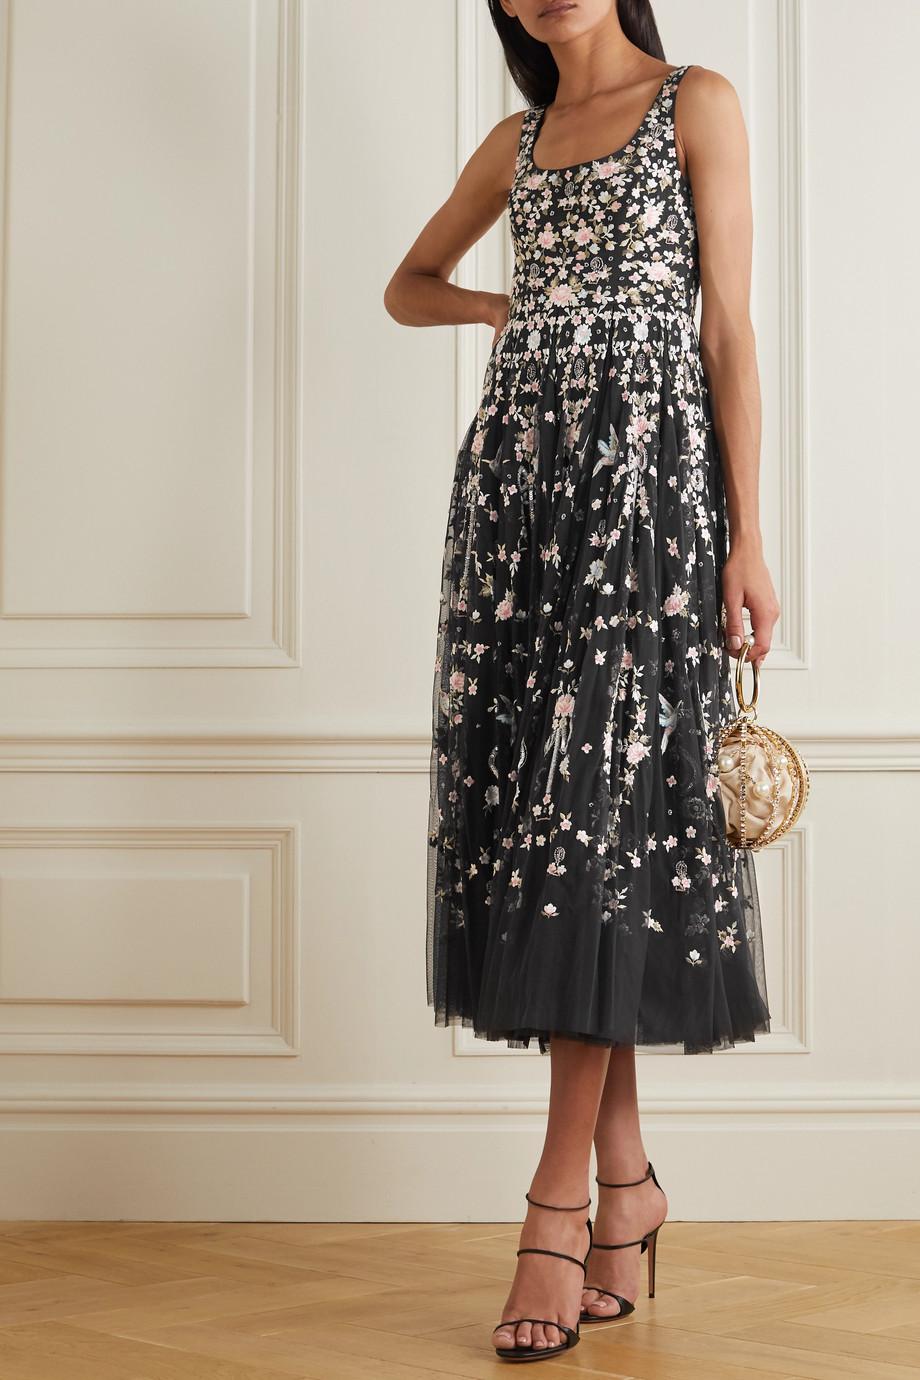 Needle & Thread Regency Garden Ballerina embellished embroidered tulle midi dress